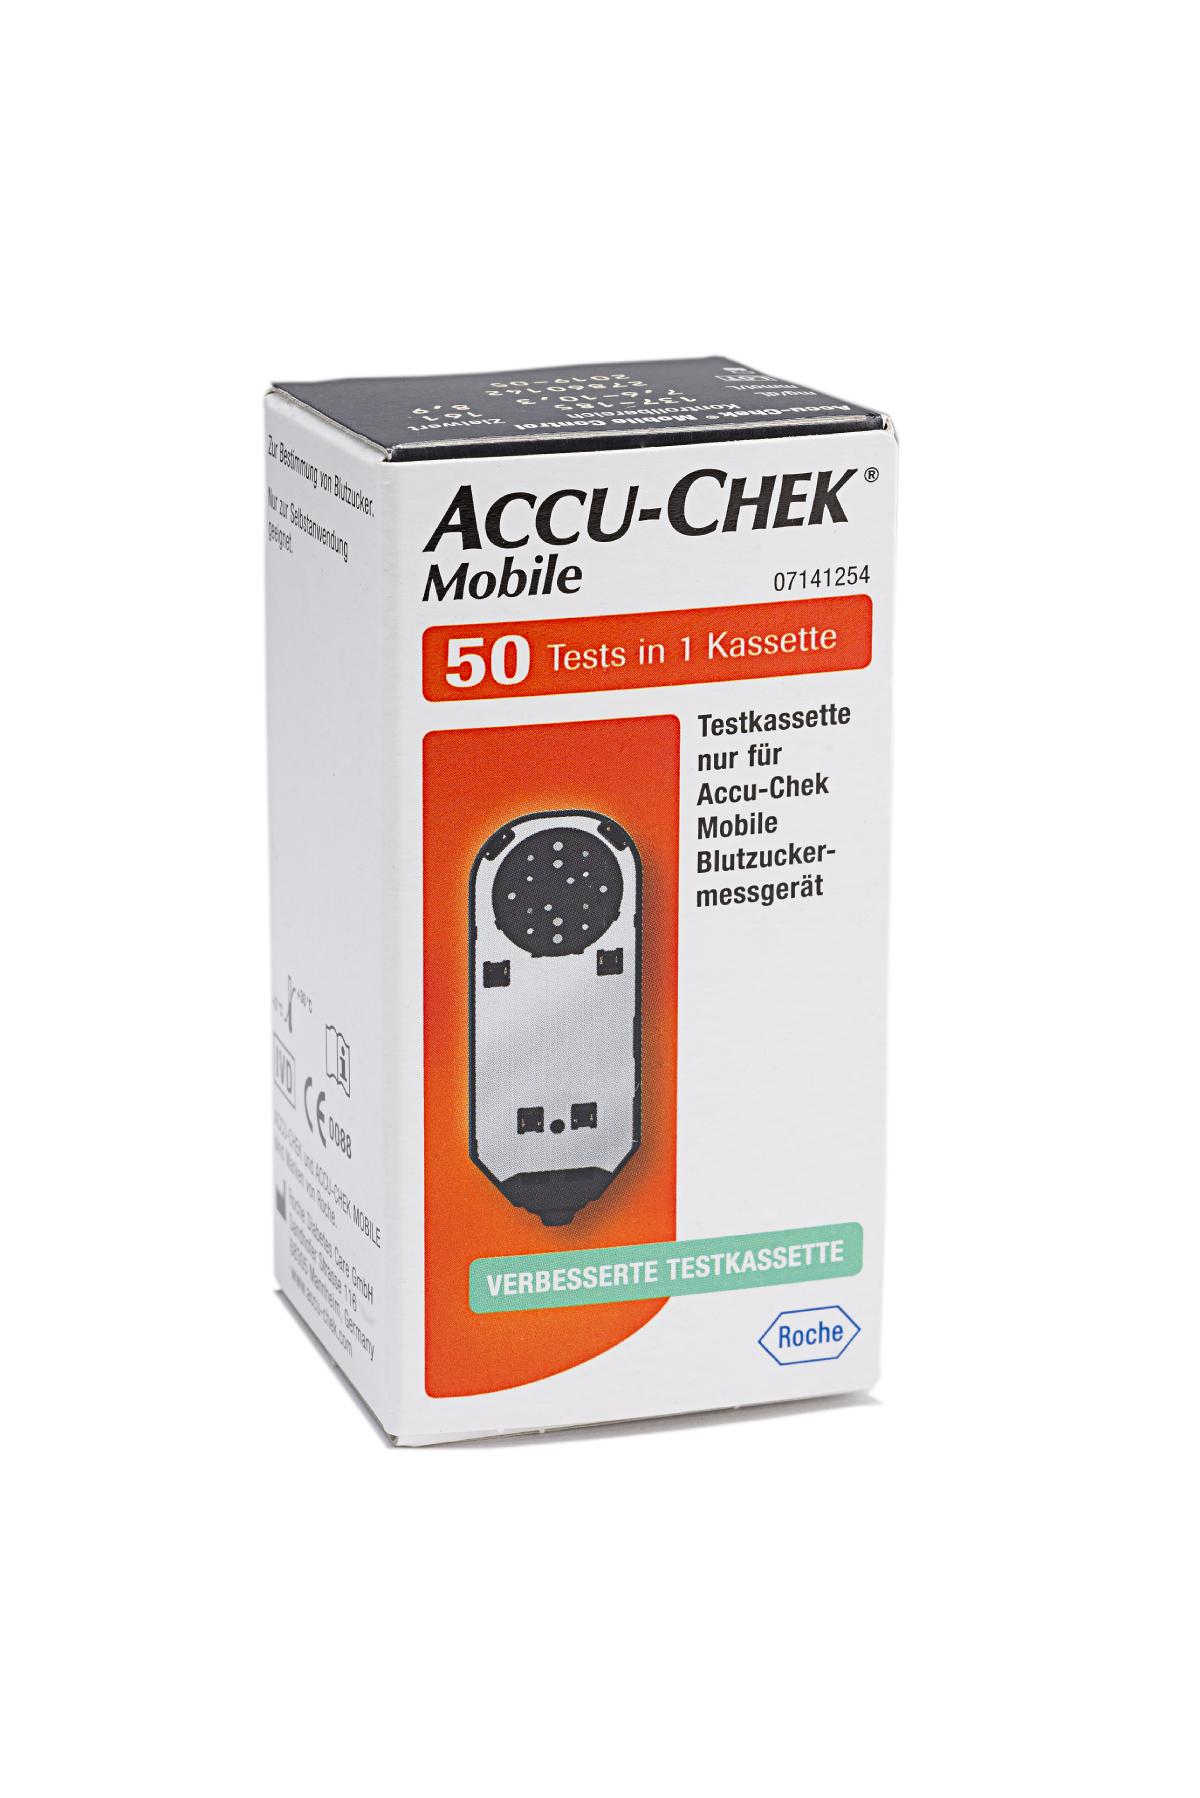 Accu-Chek Mobile Testkassette 50 Stück